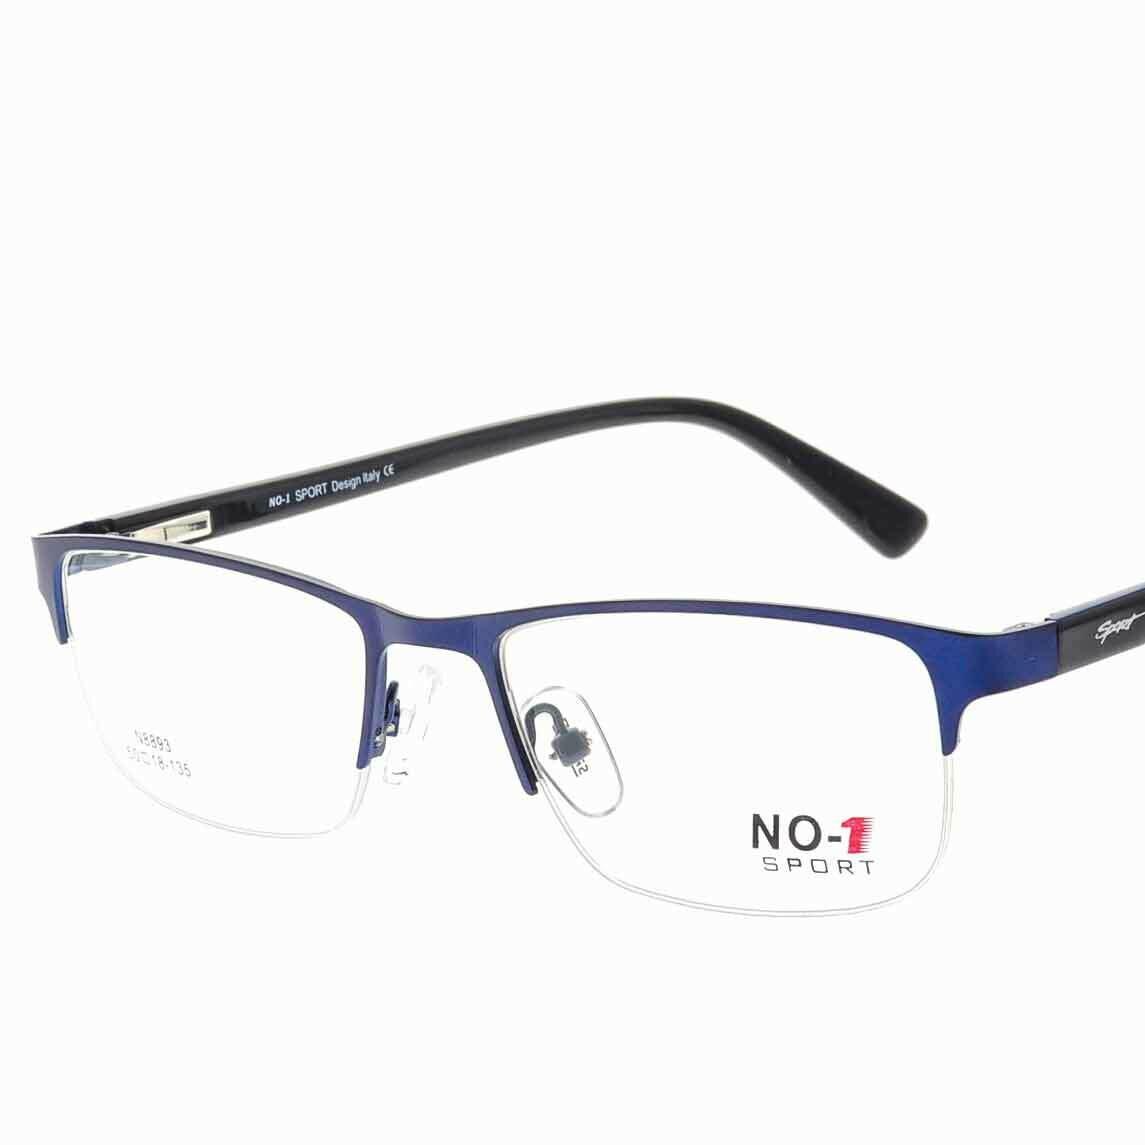 NO-1 SPORT N8893